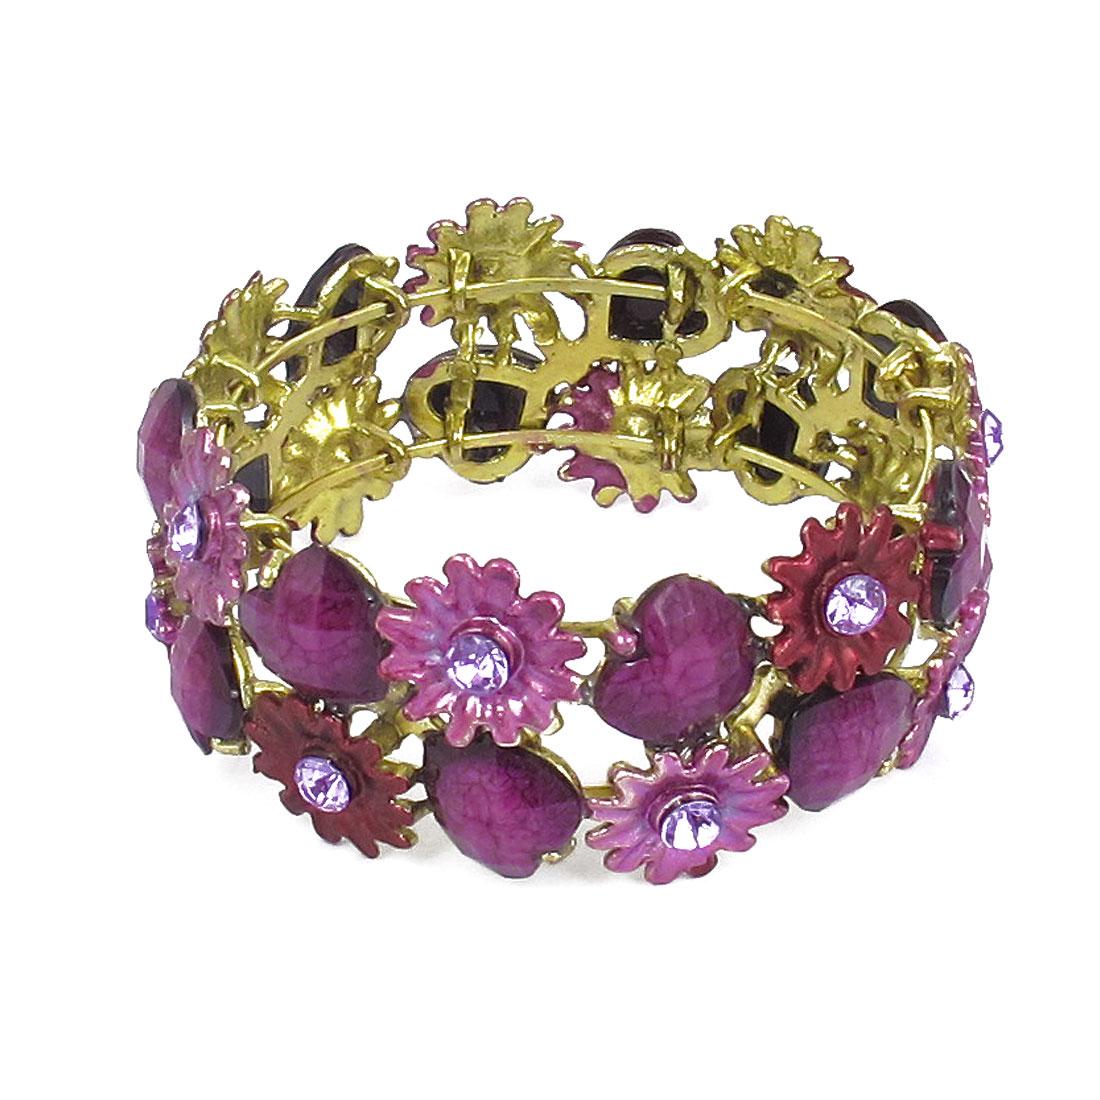 Purple Plastic Rhinestone Detailing Wrist Bracelet Bangle Ornament for Women